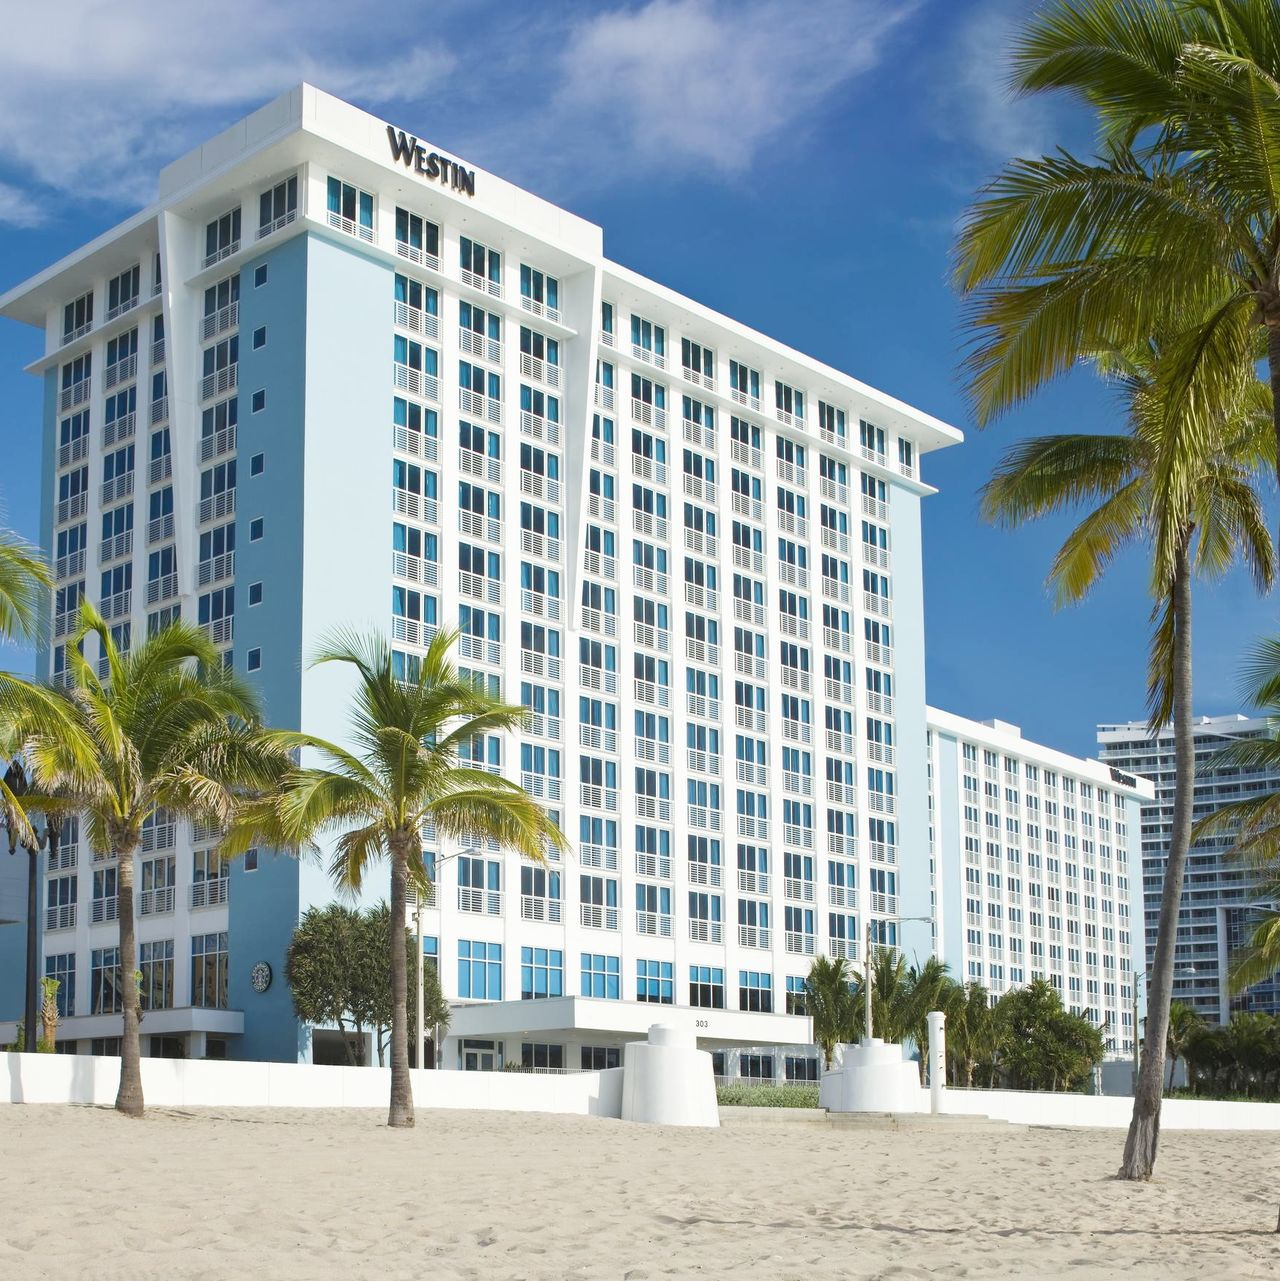 hotel florida the westin beach resort spa canusa. Black Bedroom Furniture Sets. Home Design Ideas